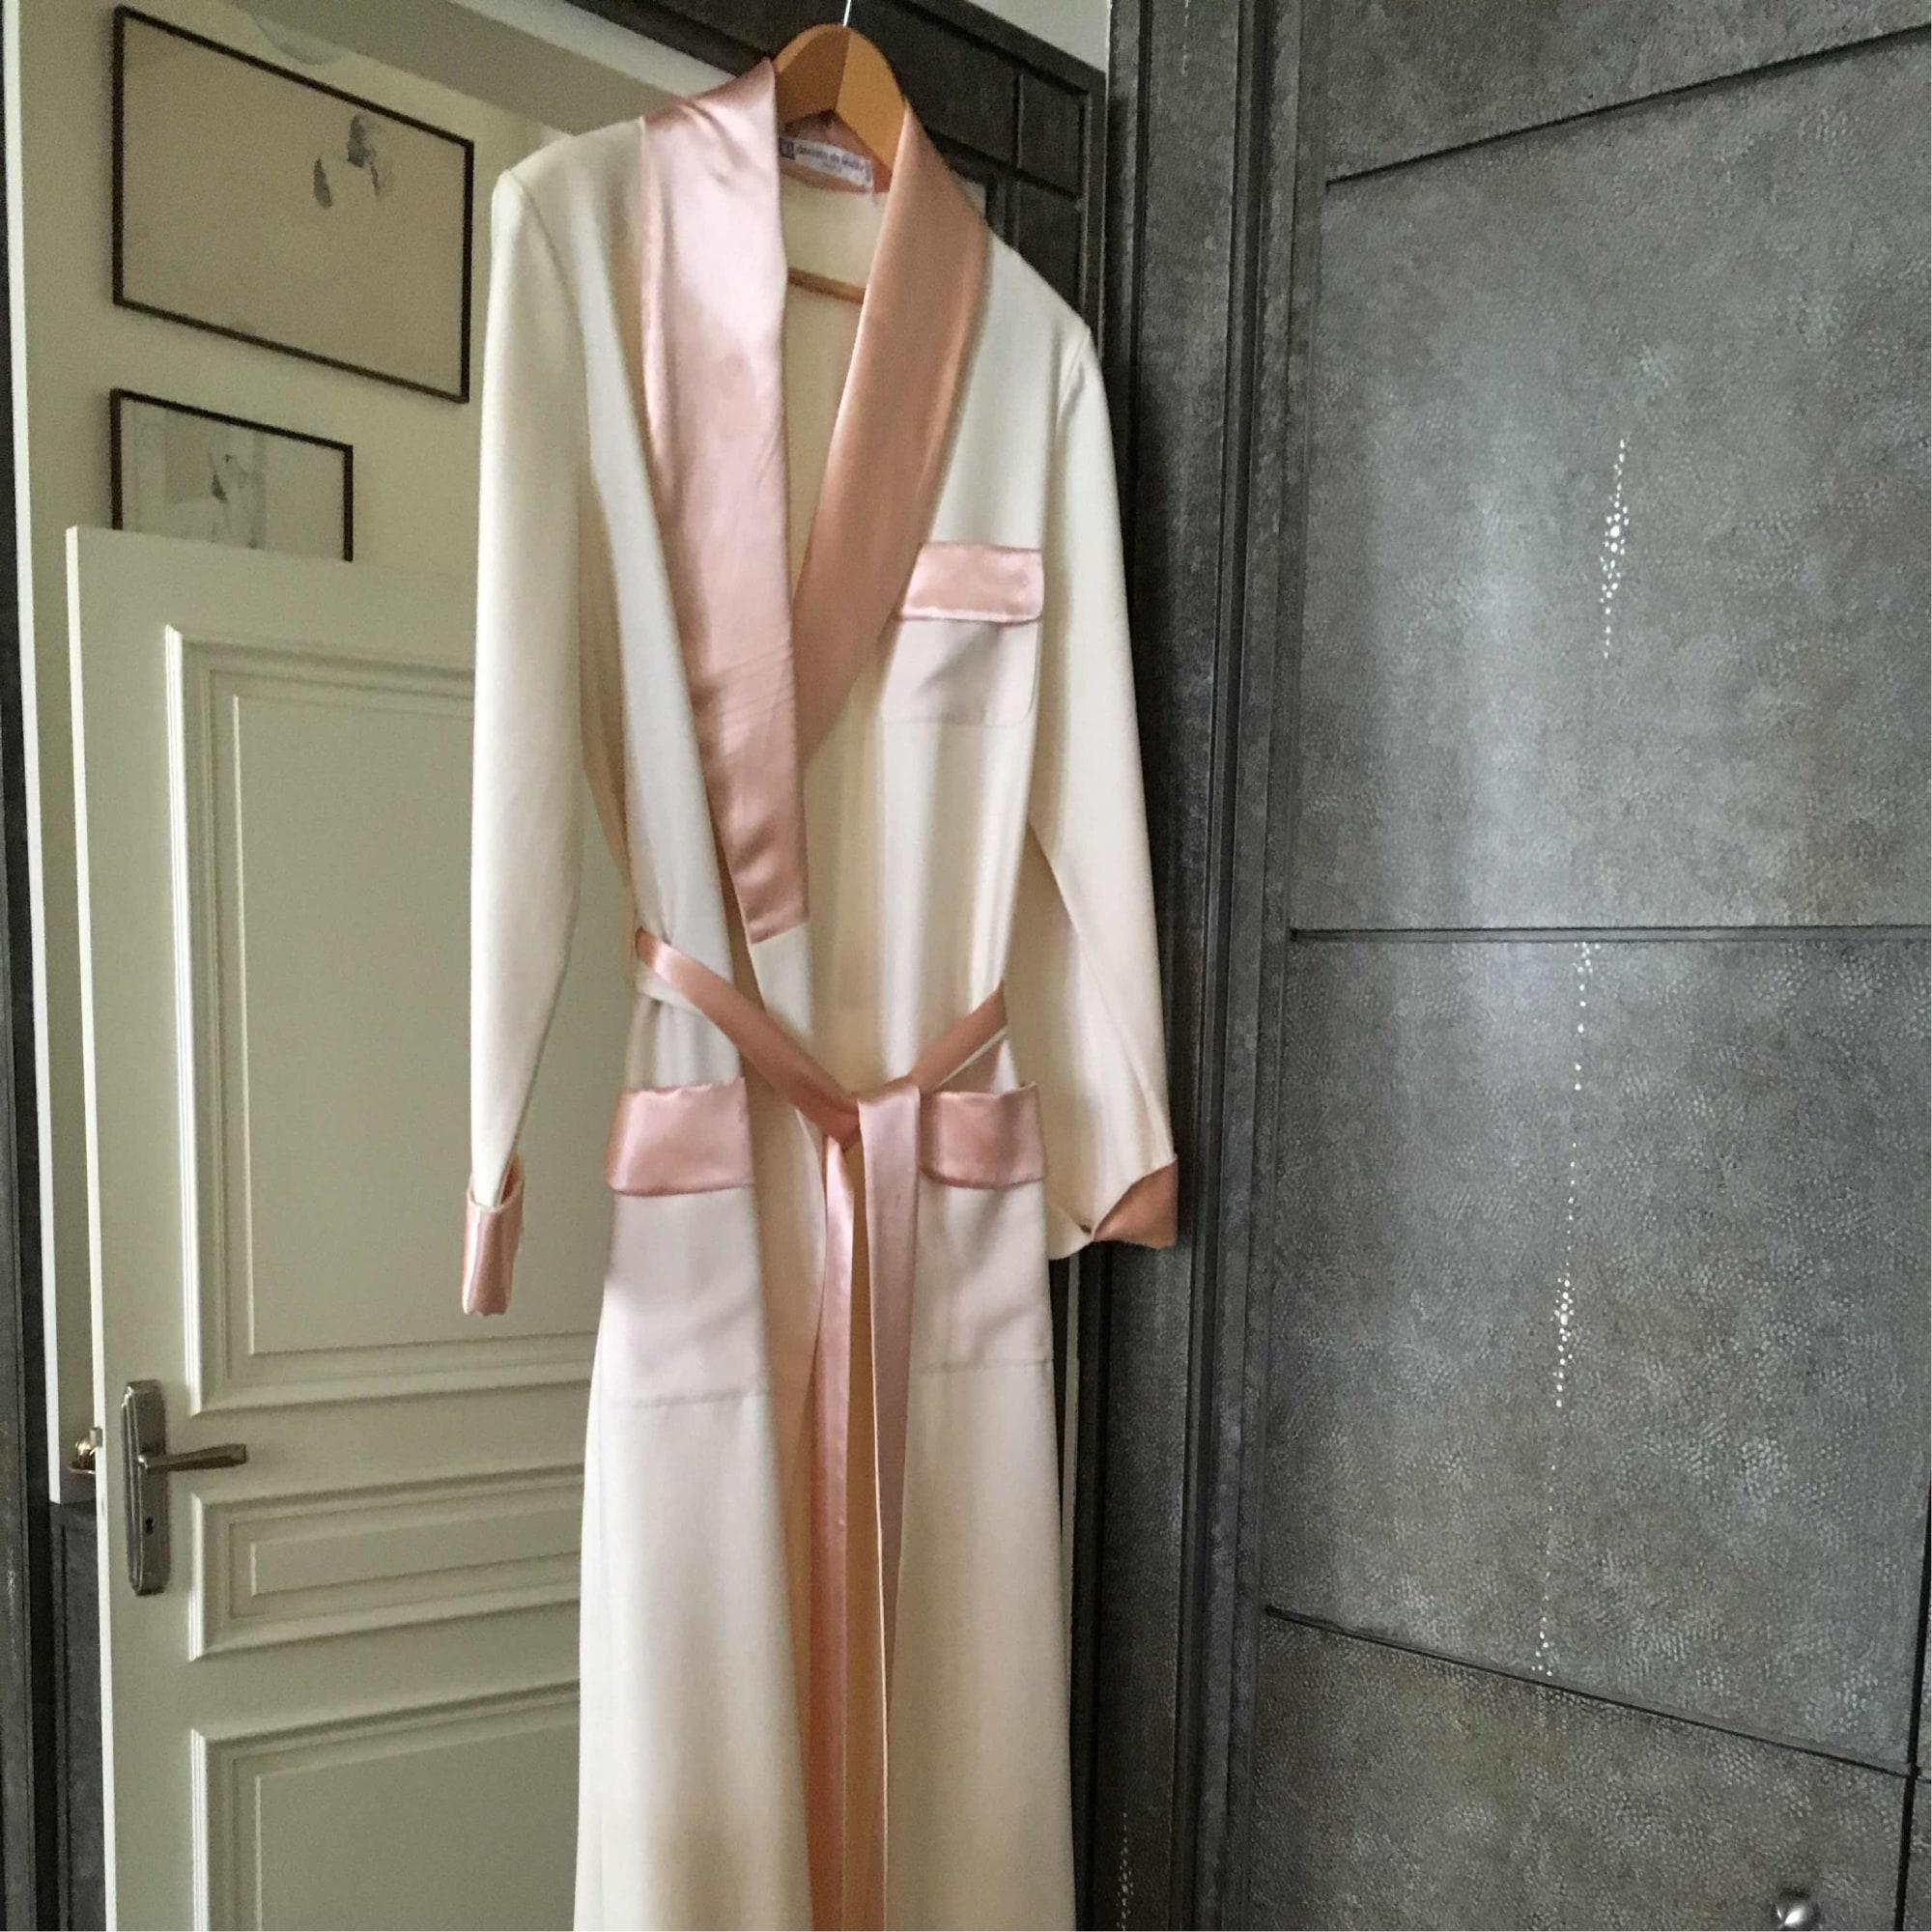 Robe de chambre marque inconnue 40 l t3 blanc 5161935 - Robes de chambre de marque ...